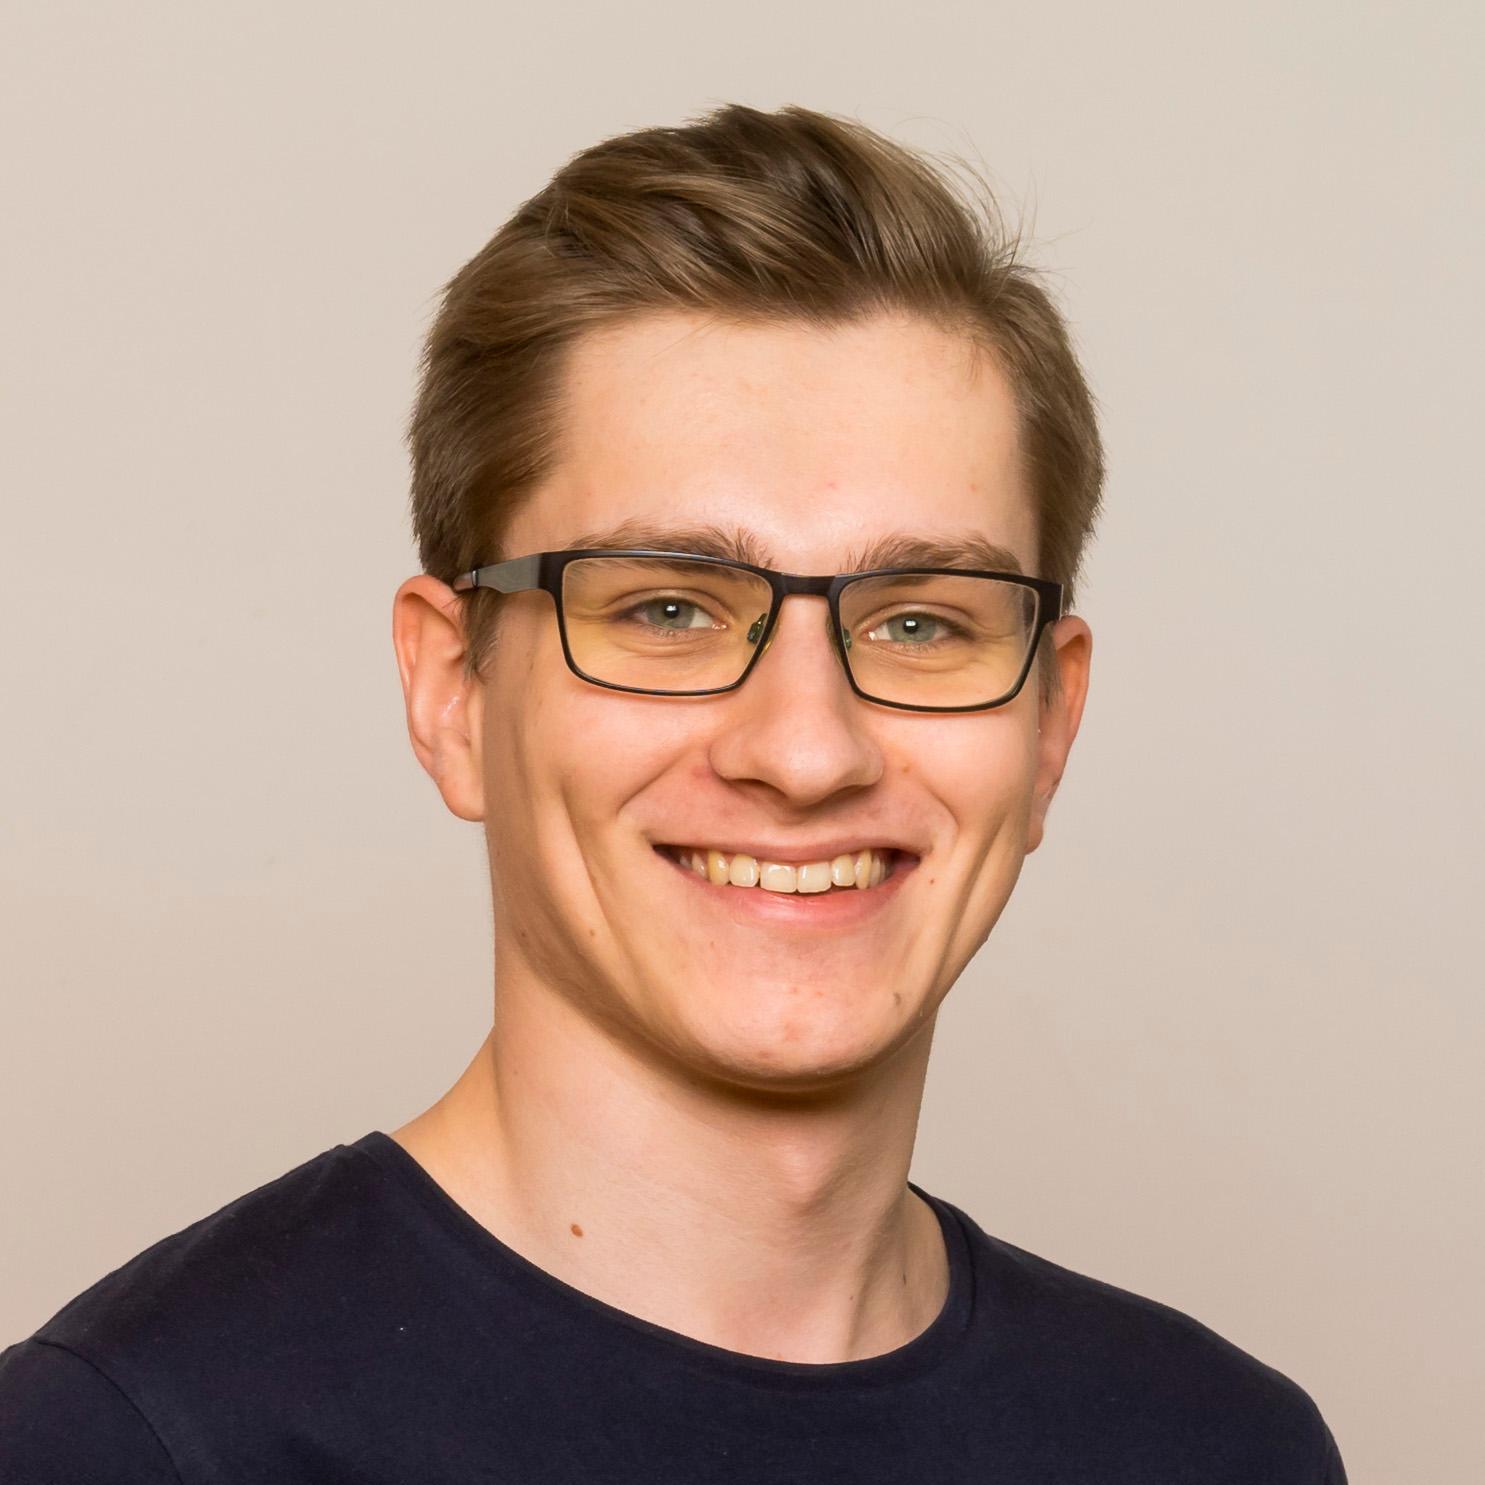 Portrait of Georg